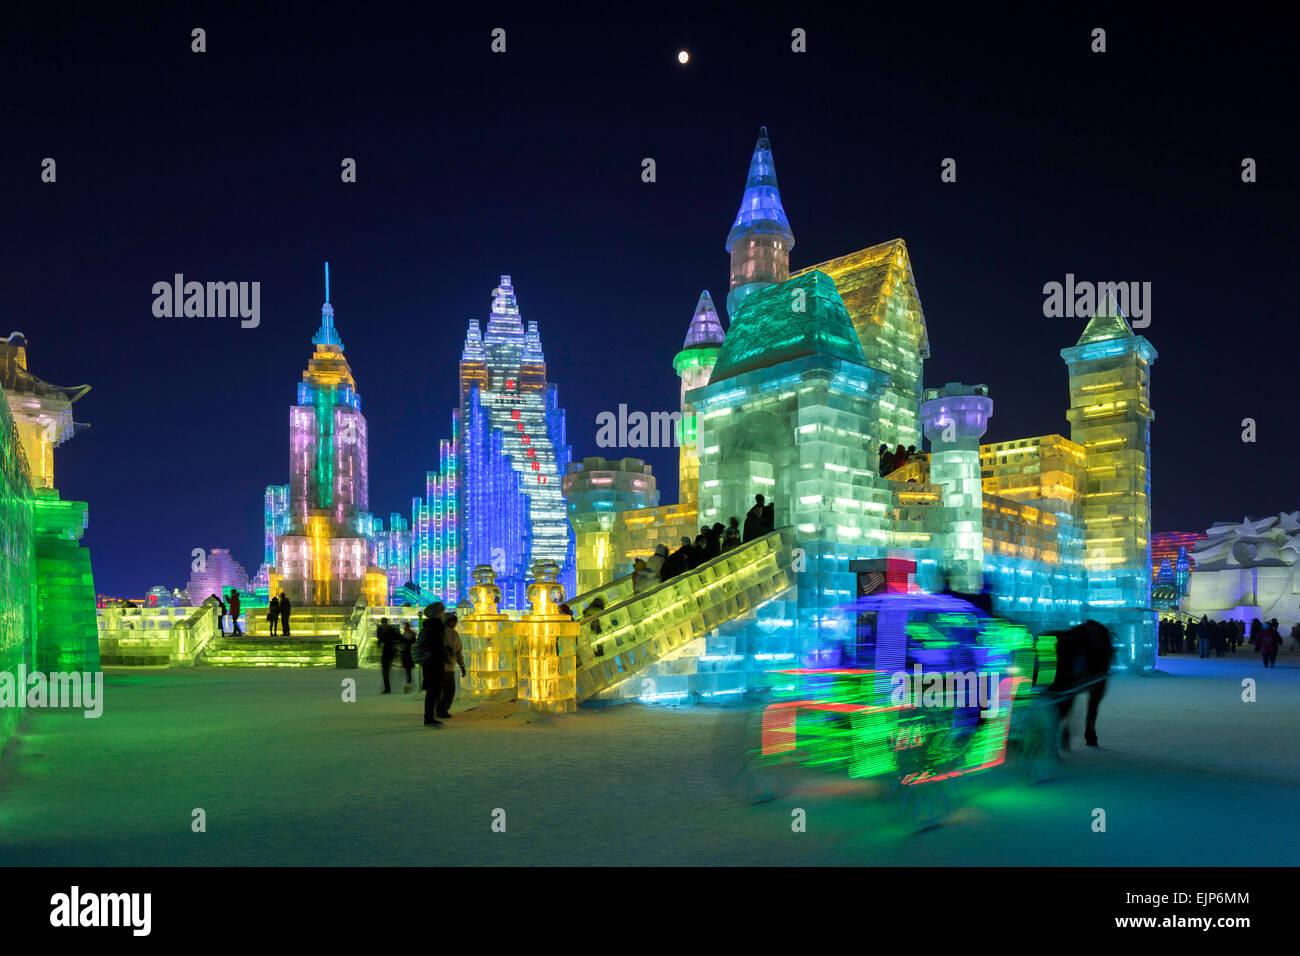 Spectacular illuminated ice sculptures, Harbin Ice and Snow Festival, Heilongjiang Province, China Stock Photo